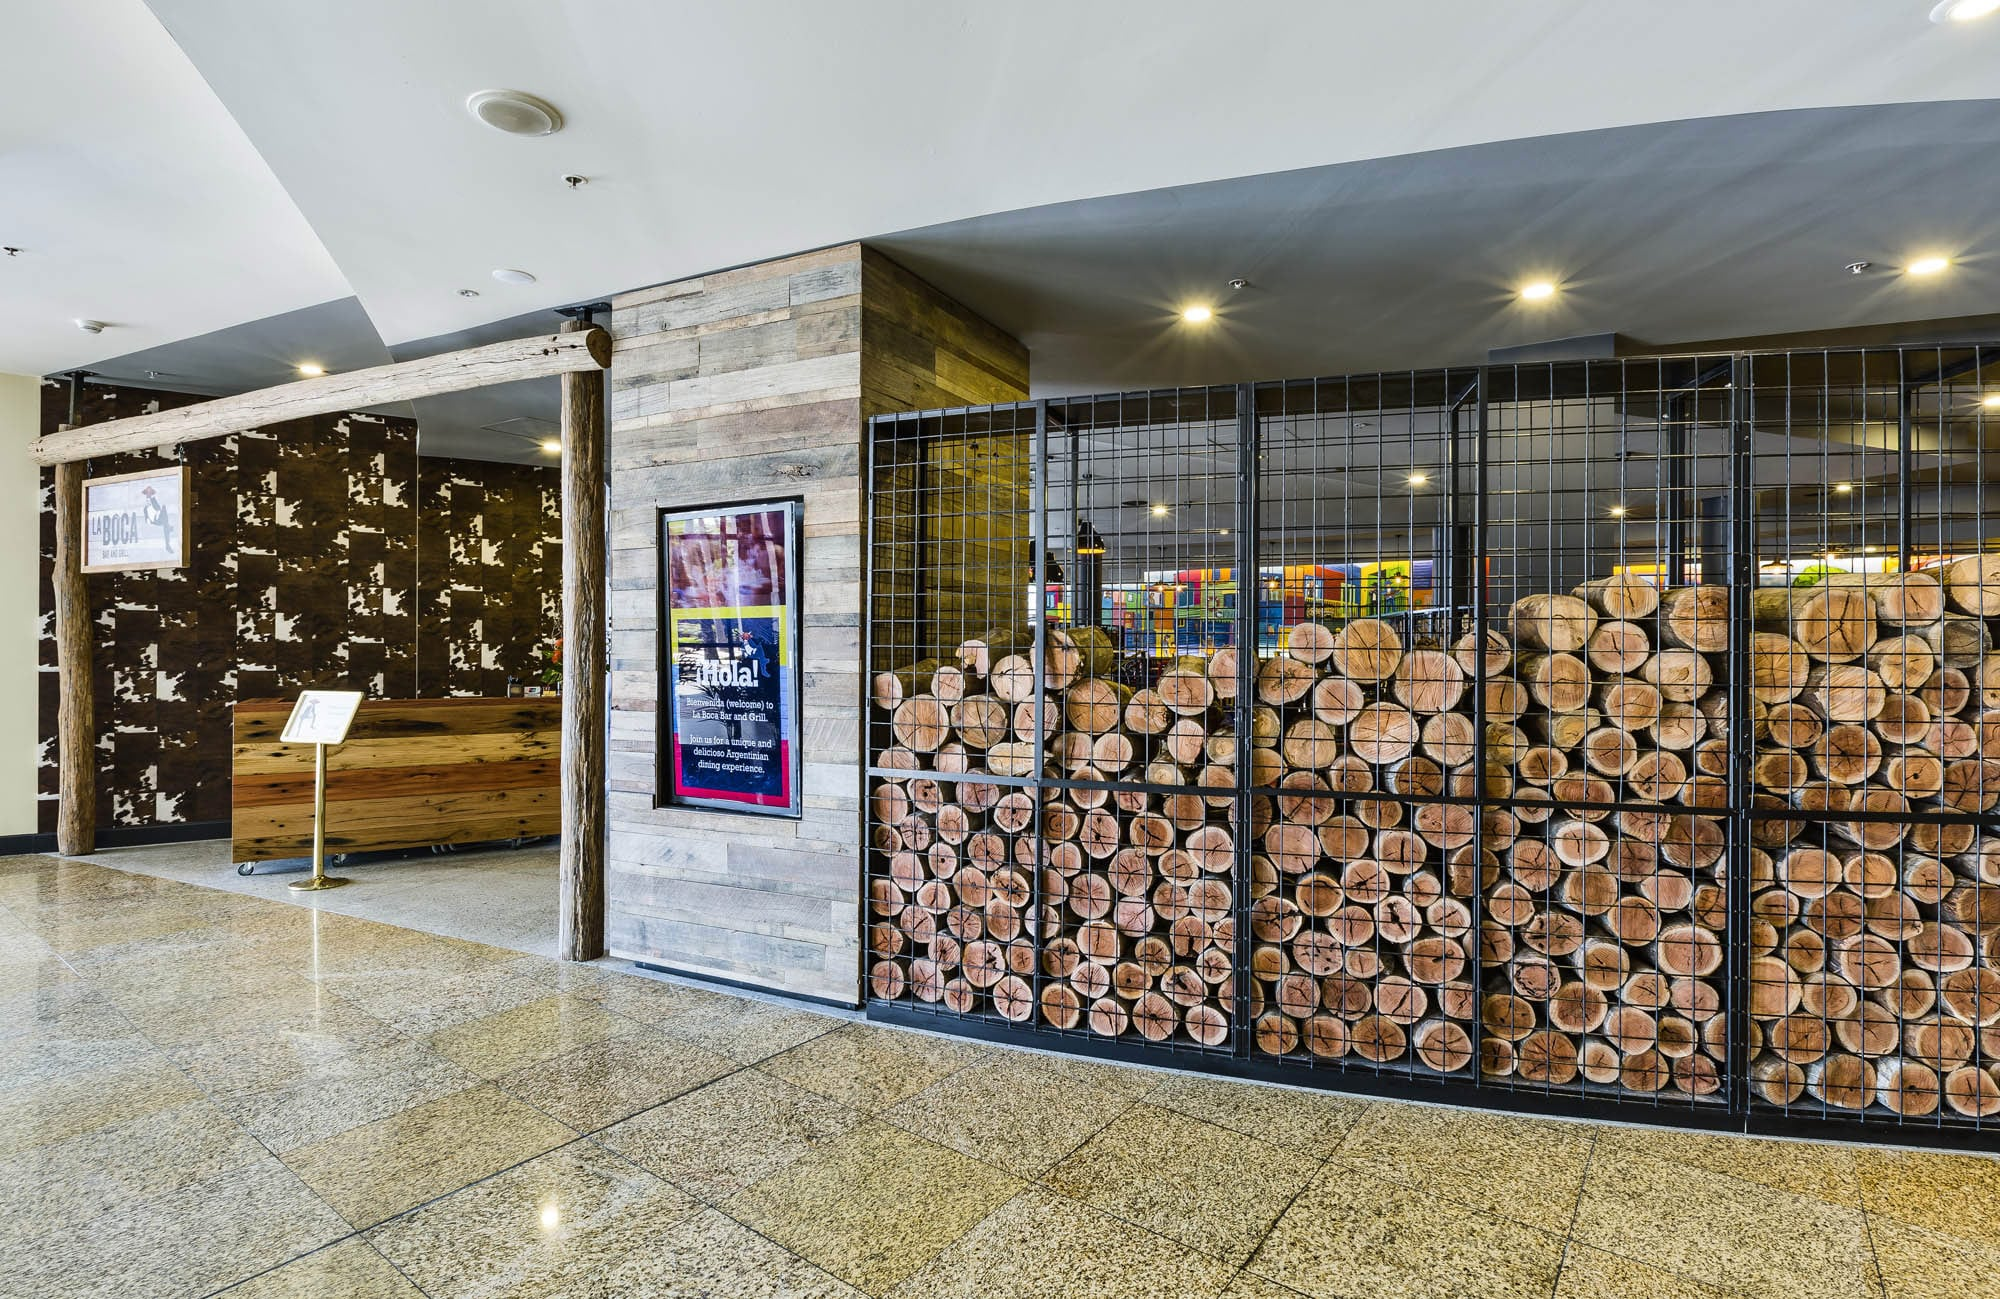 laboca bar and grill sydney exteiror timber logs